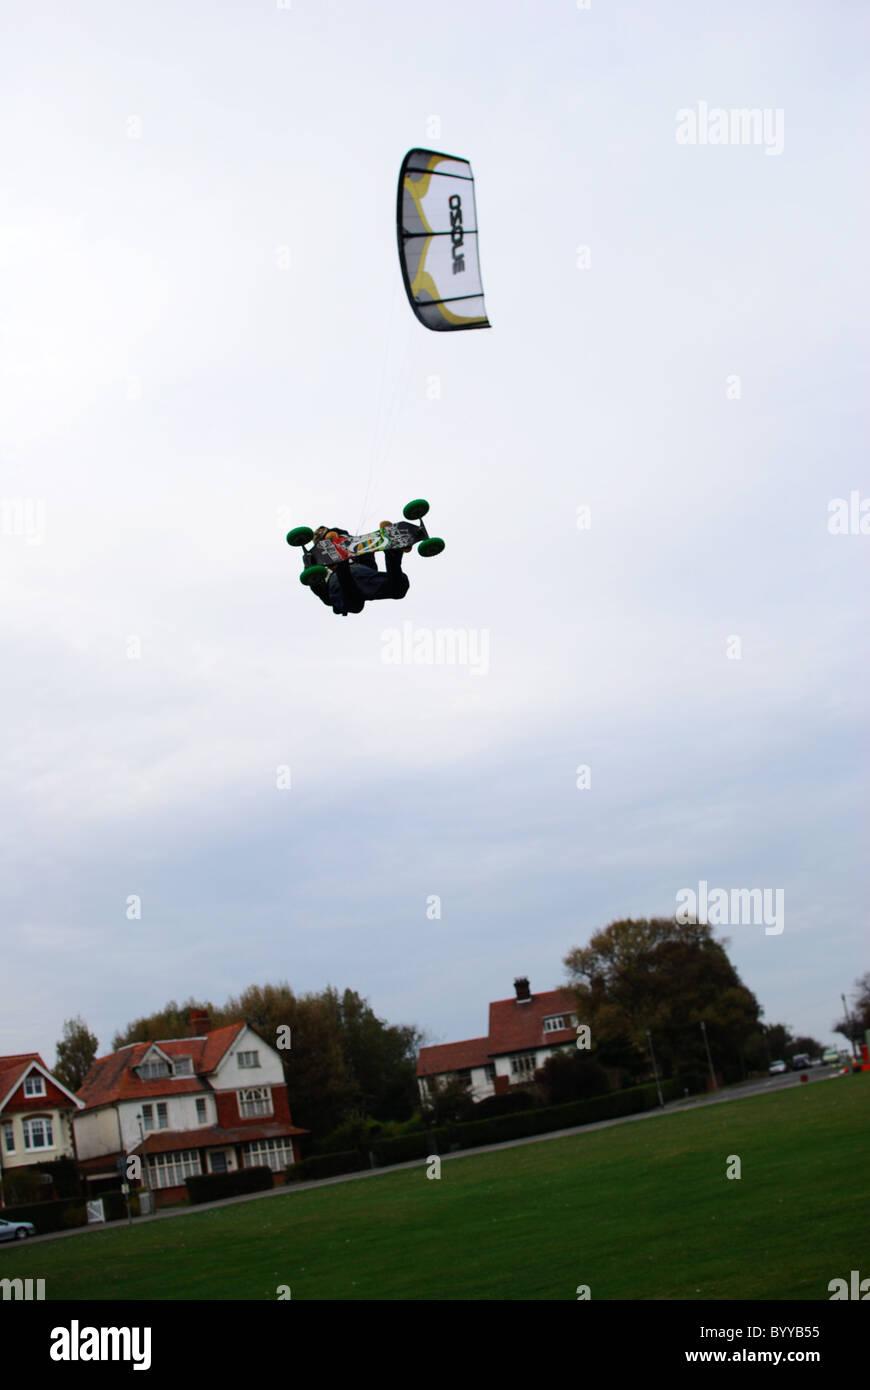 Extreme sport kiteboarding in Frinton-on-Sea - Stock Image